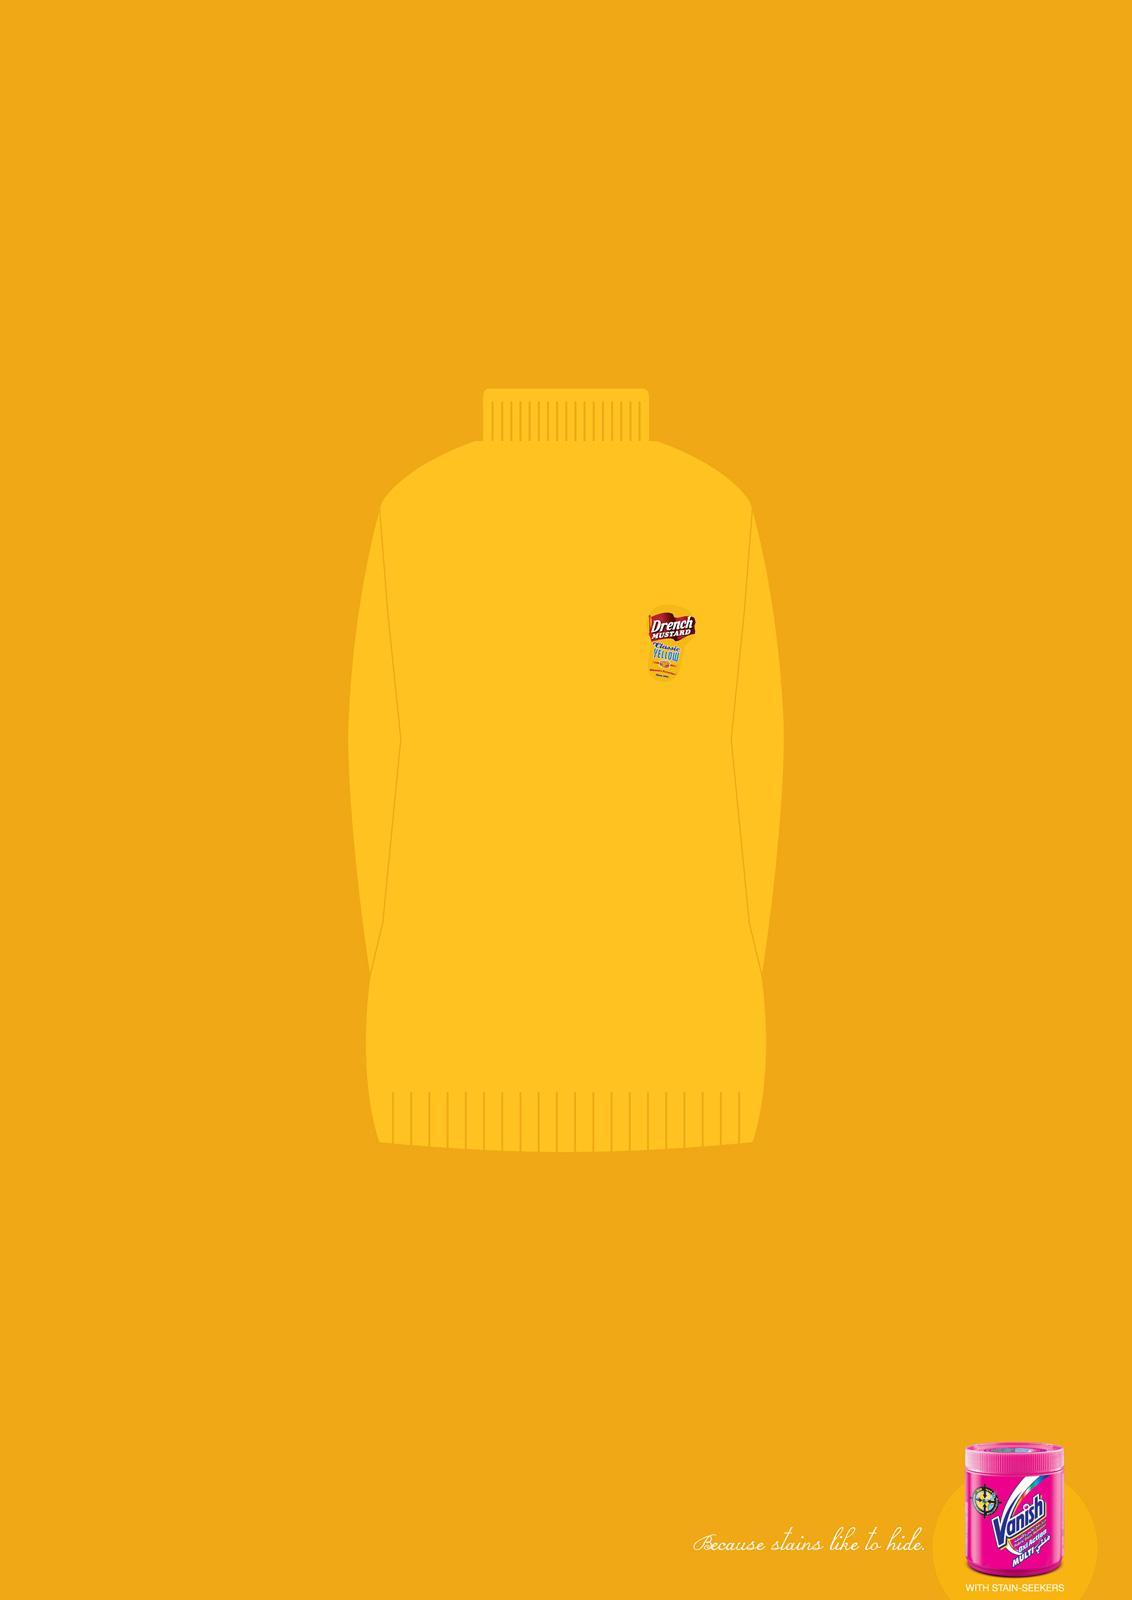 Vanish Print Ad -  Mustard